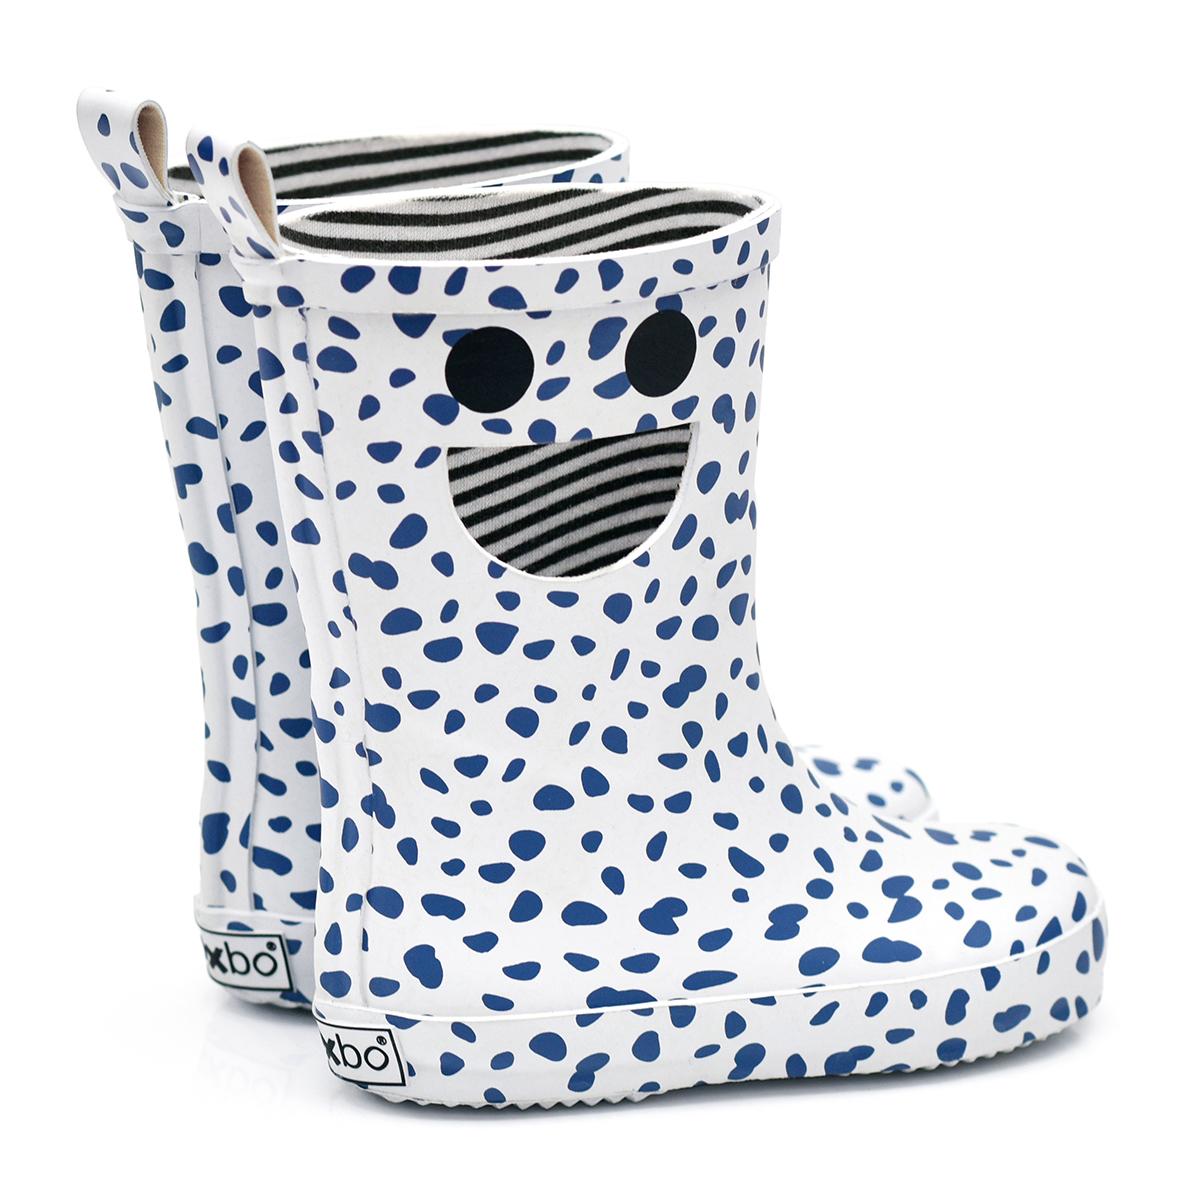 Chaussons & Chaussures Bottes Wistiti Snowflok - 21 Bottes Wistiti Snowflok - 21